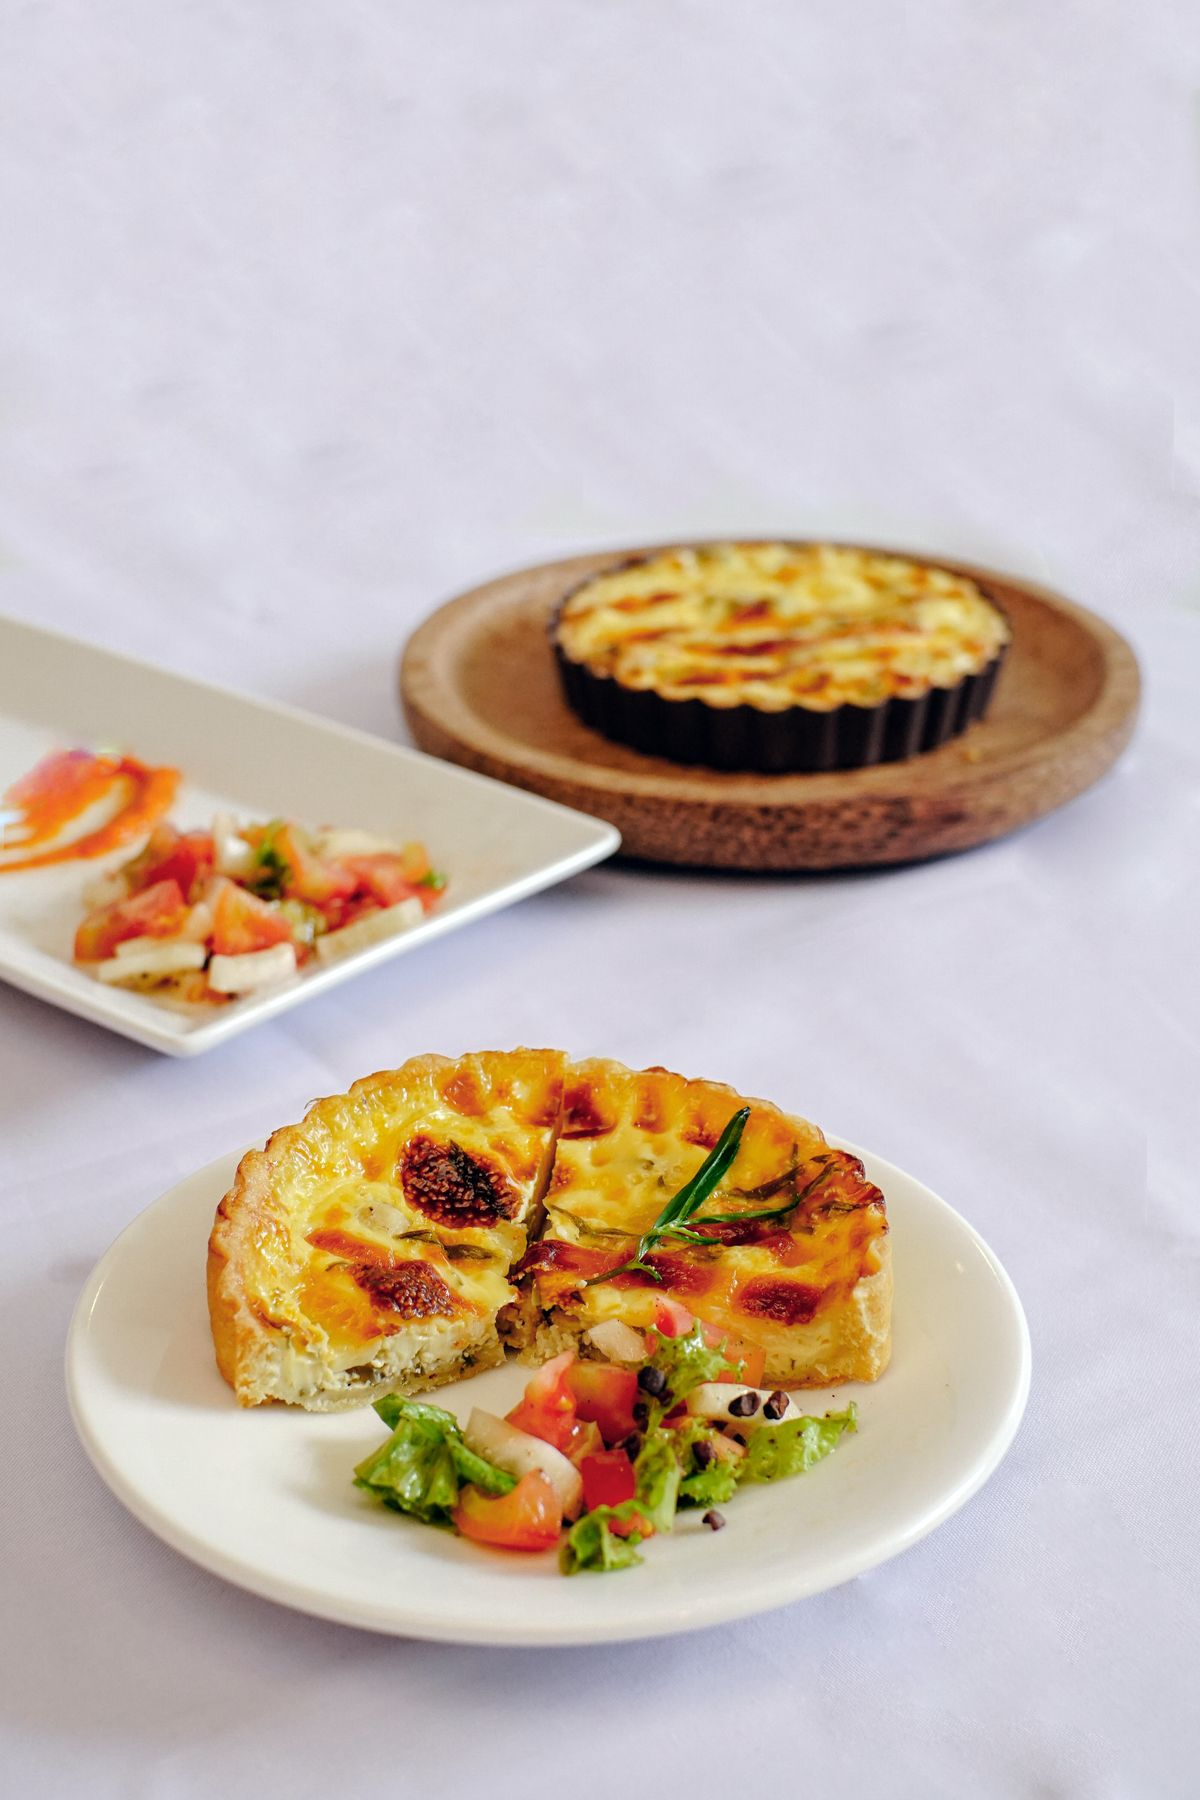 French Restaurants in Goa